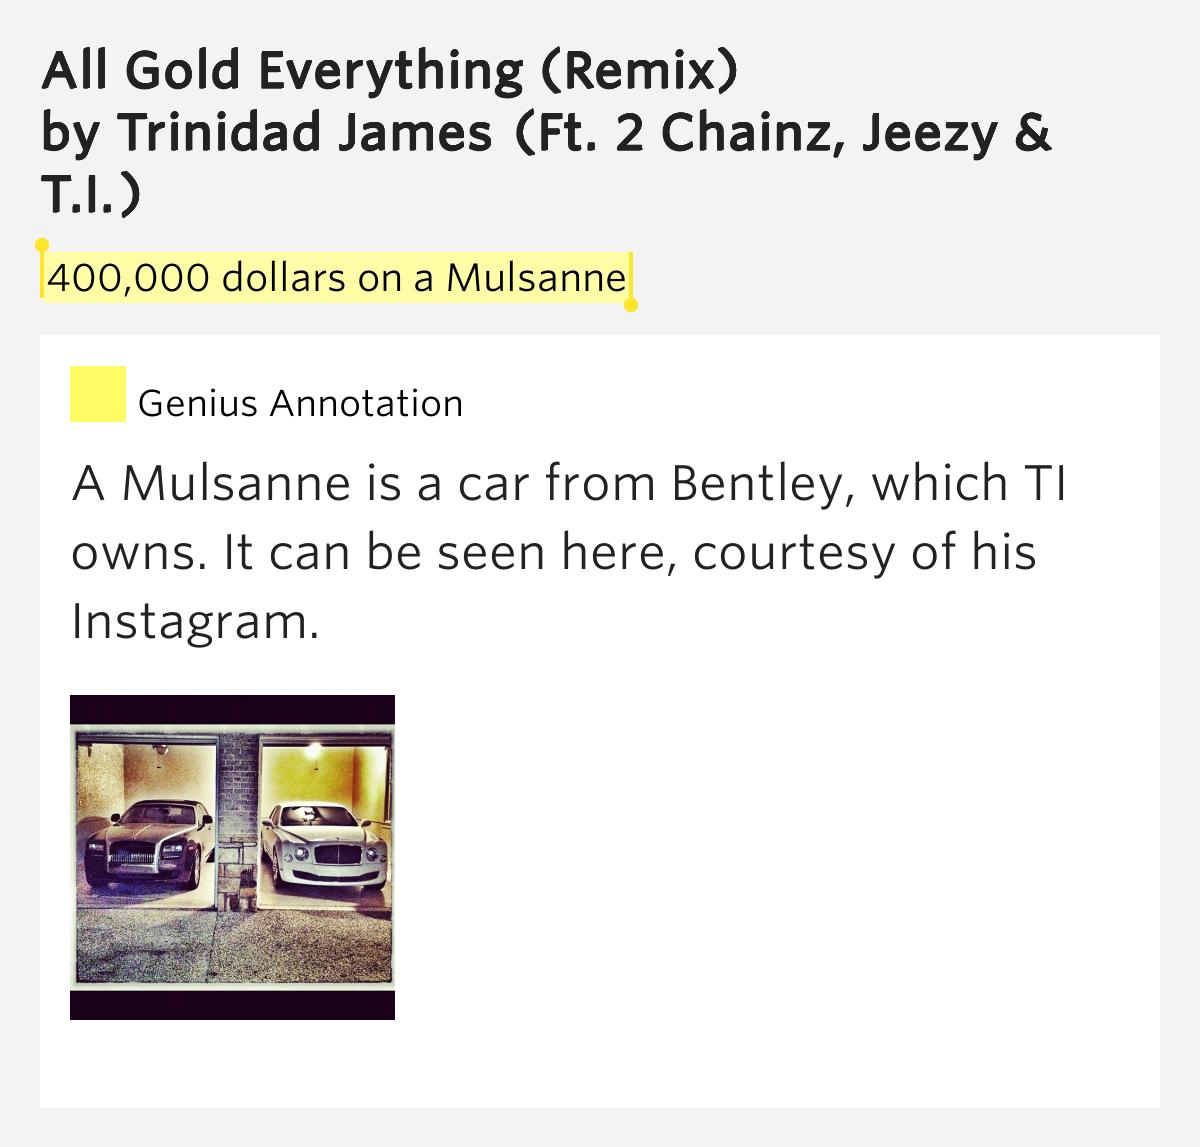 All Gold Everything Remix Lyrics